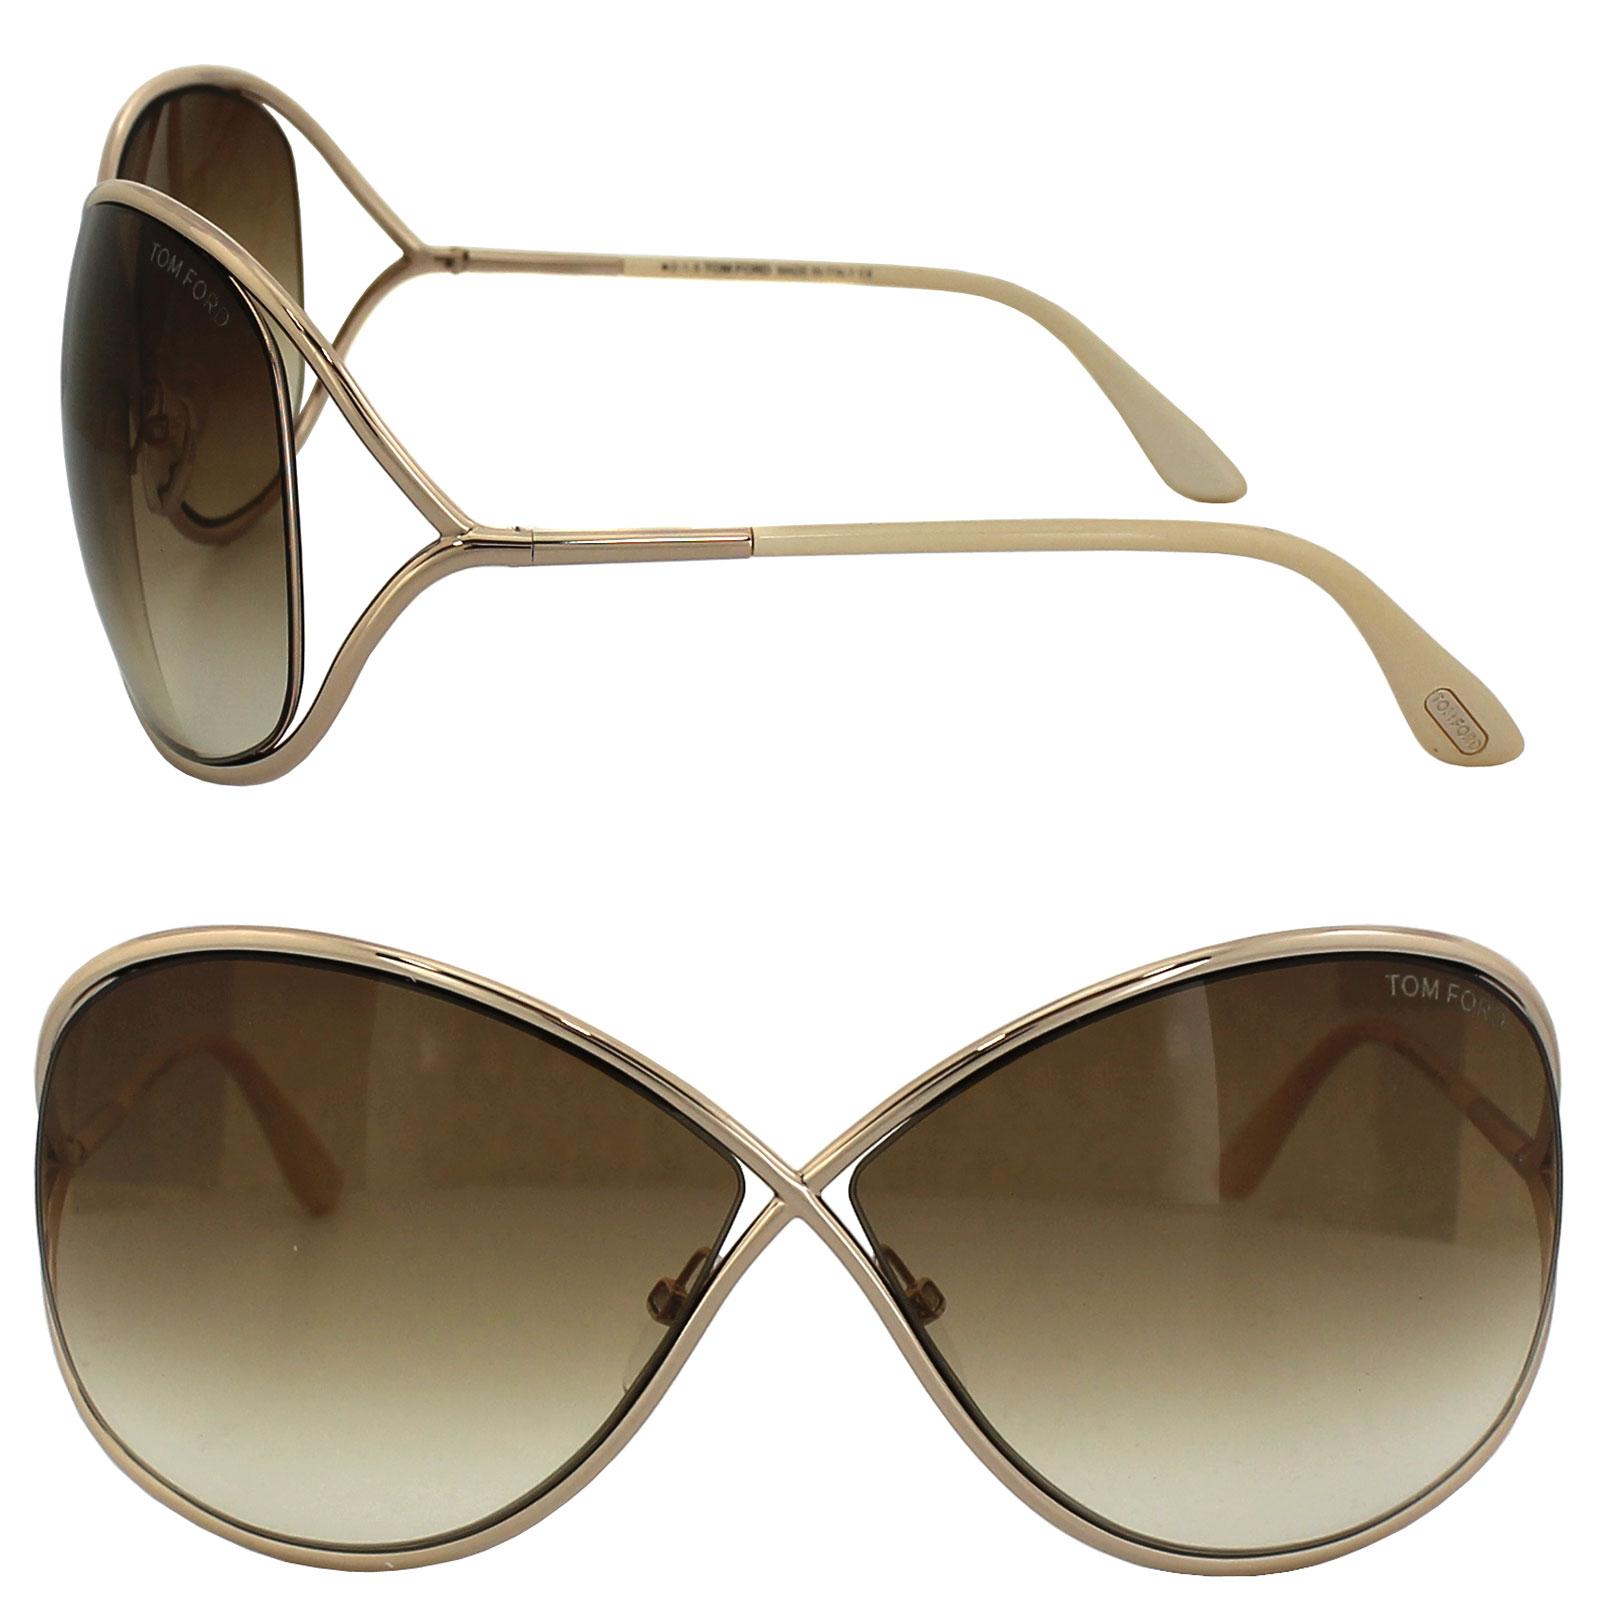 687467415556 Cheap Tom Ford 0130 Miranda Sunglasses - Discounted Sunglasses